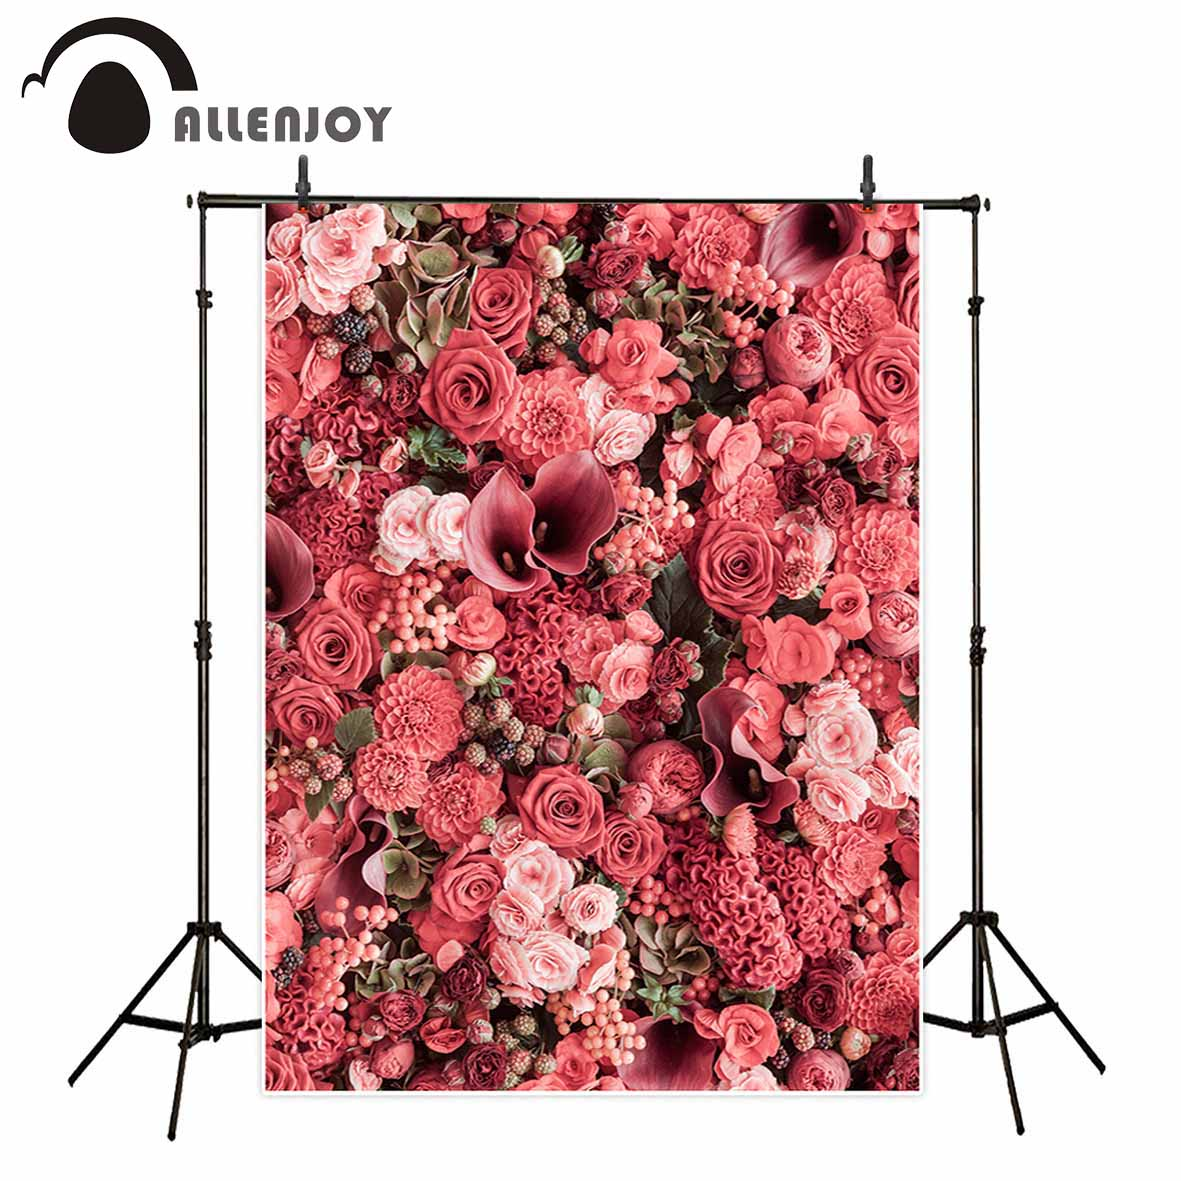 Allenjoy naturism children background Romantic Valentine's Day flowers beautiful rose love 250cm*250cm customize size backdrop